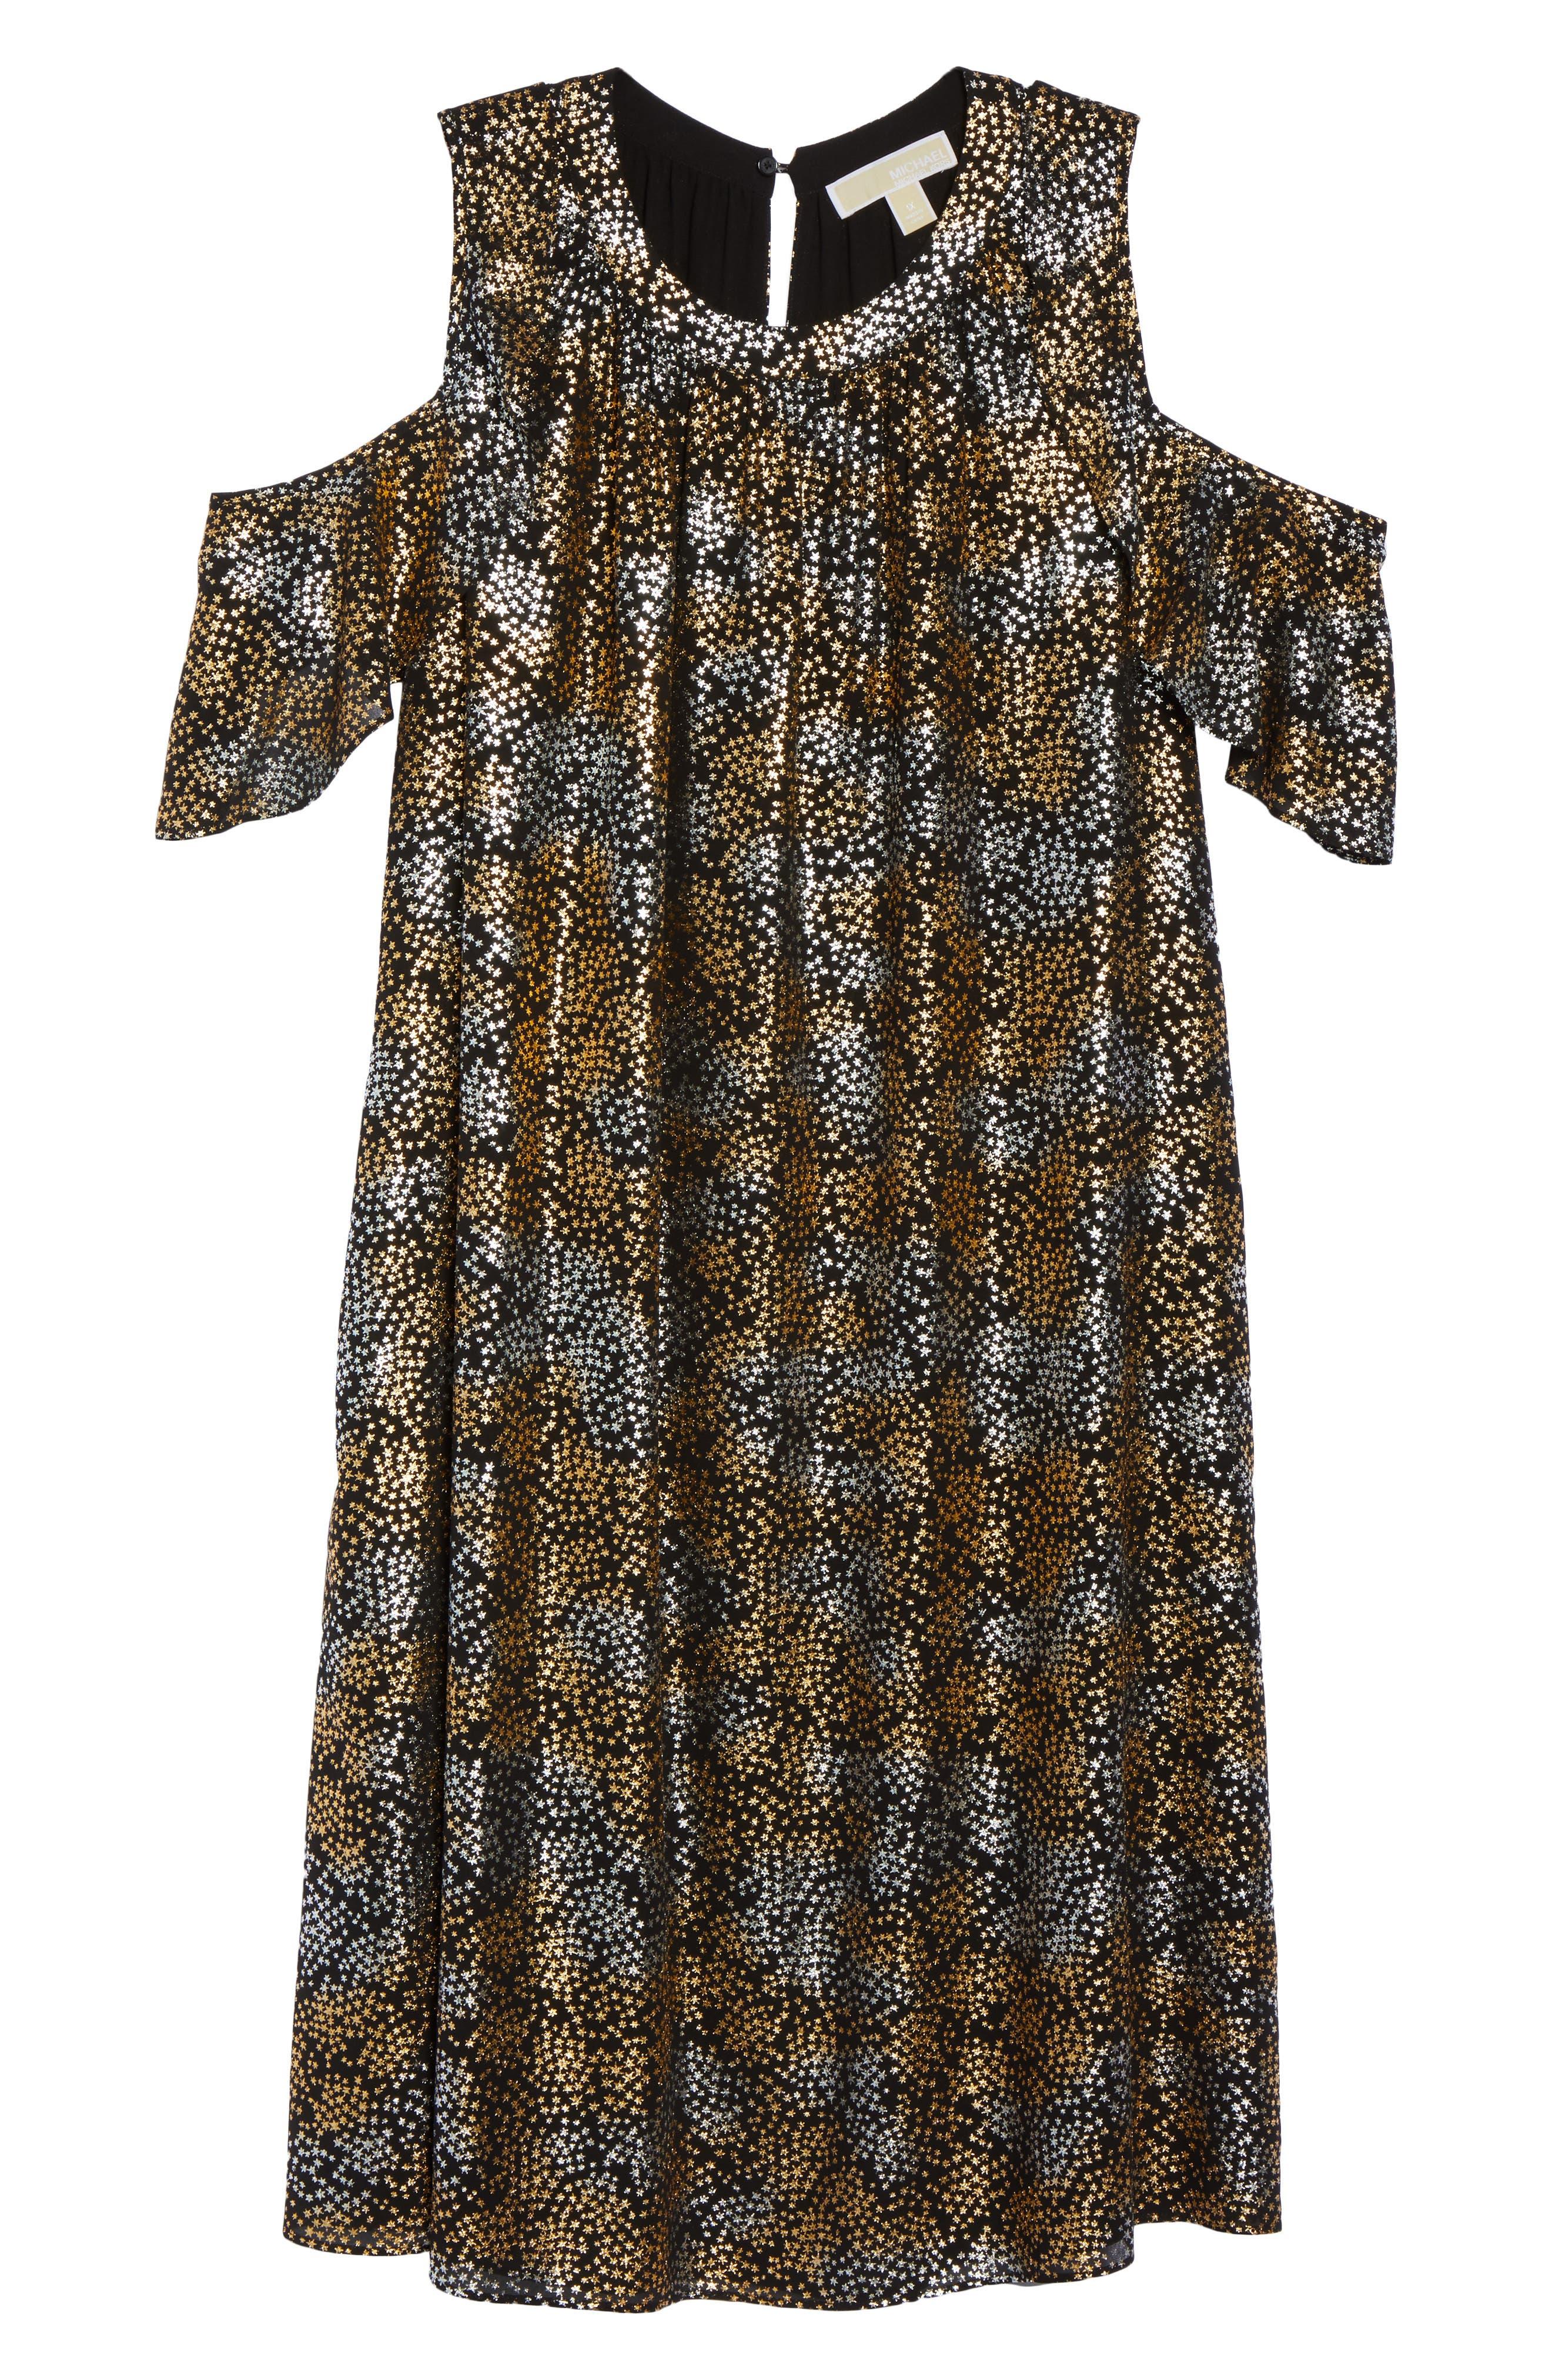 Cold Shoulder Metallic Star A-Line Dress,                             Alternate thumbnail 6, color,                             047